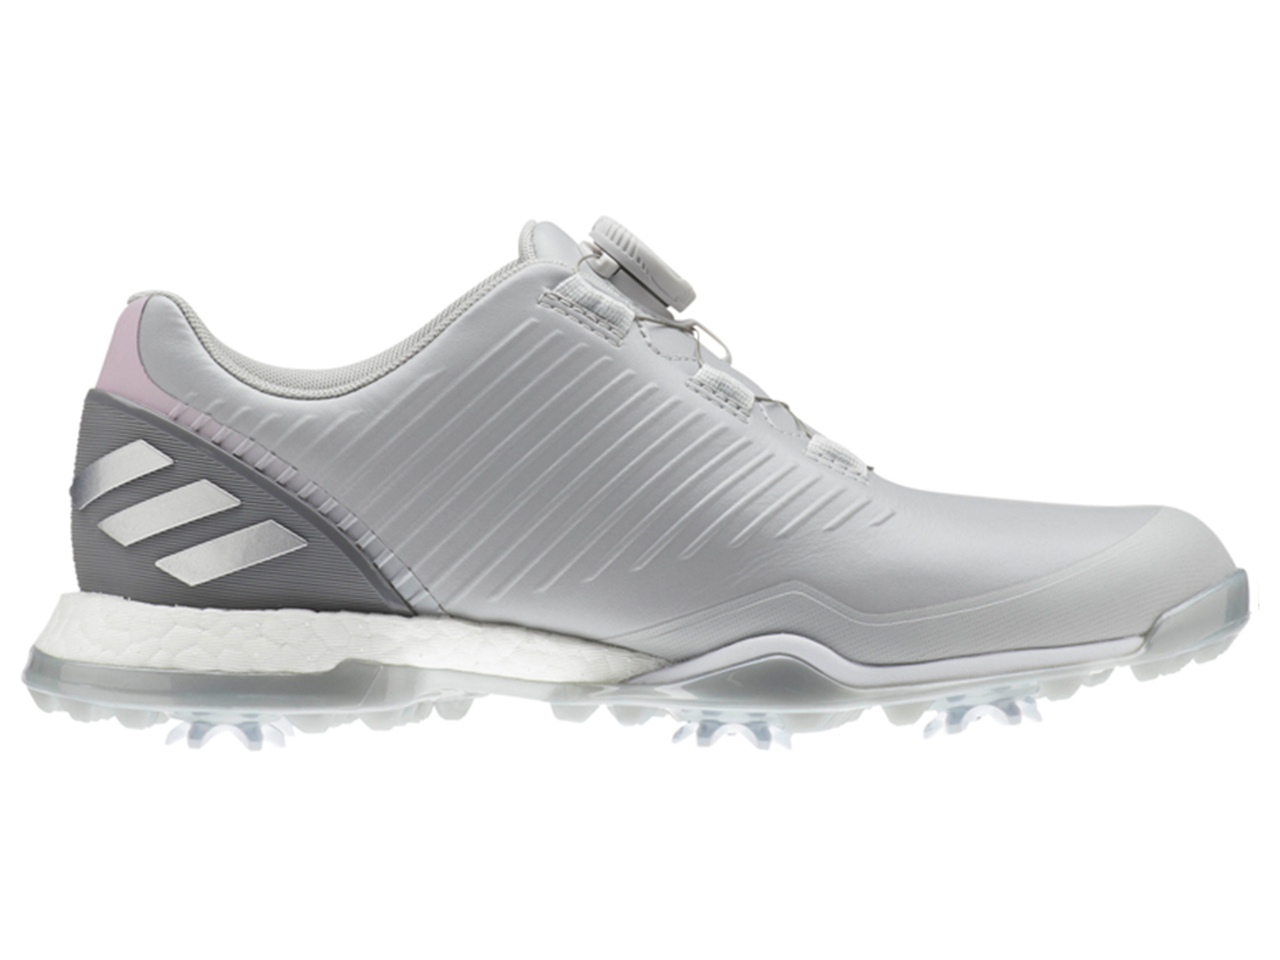 low priced 96fe1 ec224 Adidas W Adipower 4orged BOA Golf Shoes - Grey TwoTrue Pink. Adidas